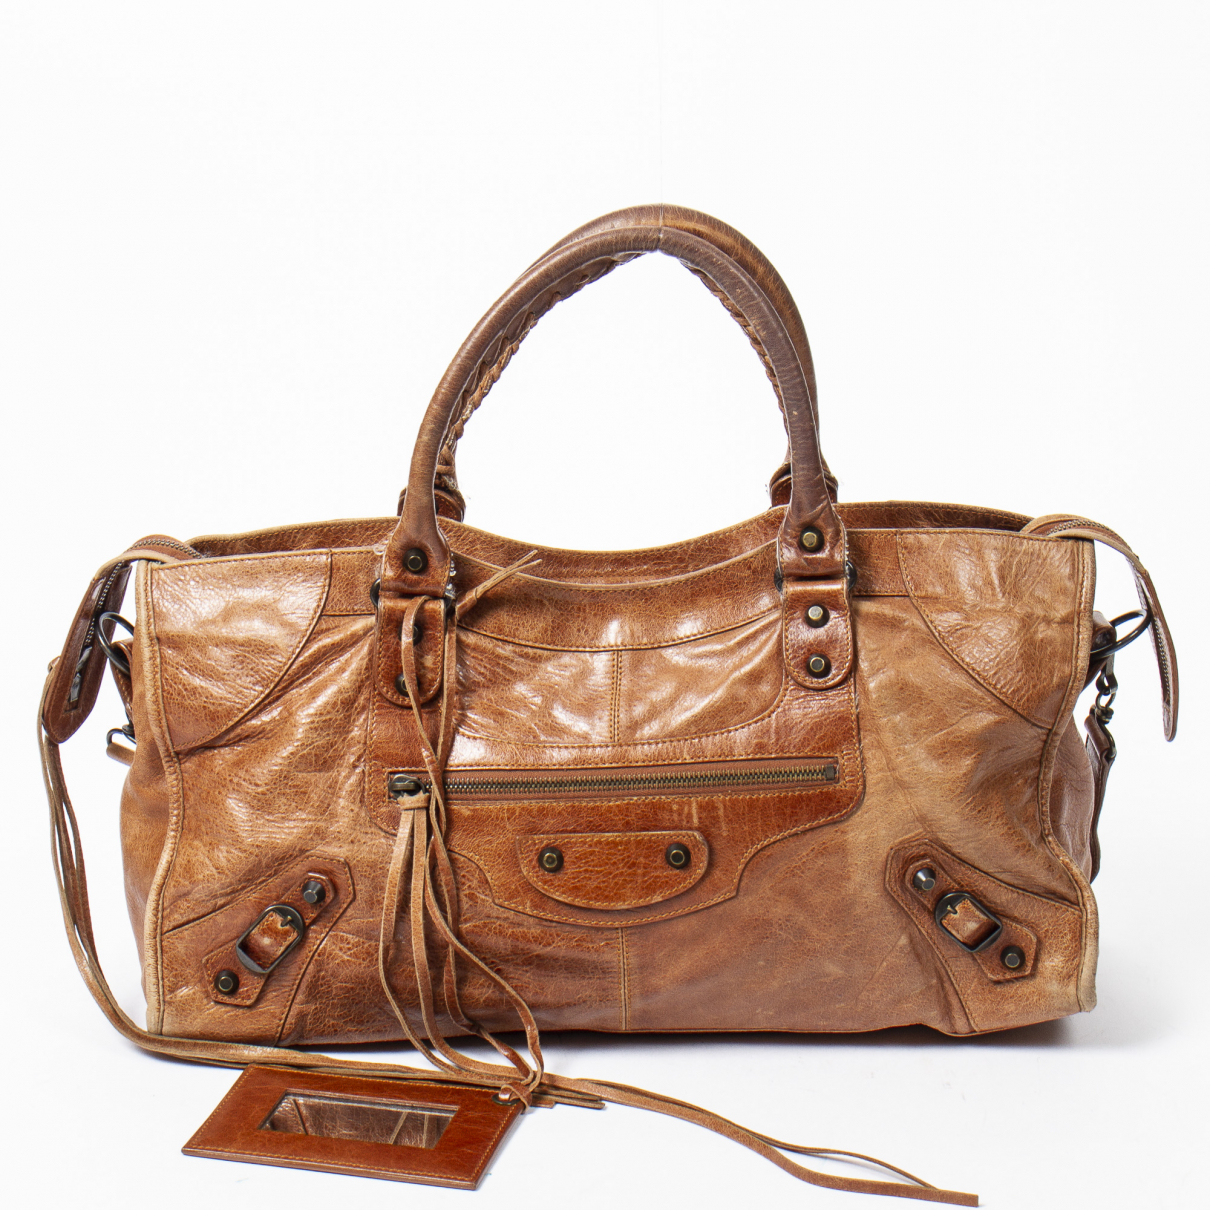 Balenciaga - Sac a main Part Time pour femme en cuir - marron